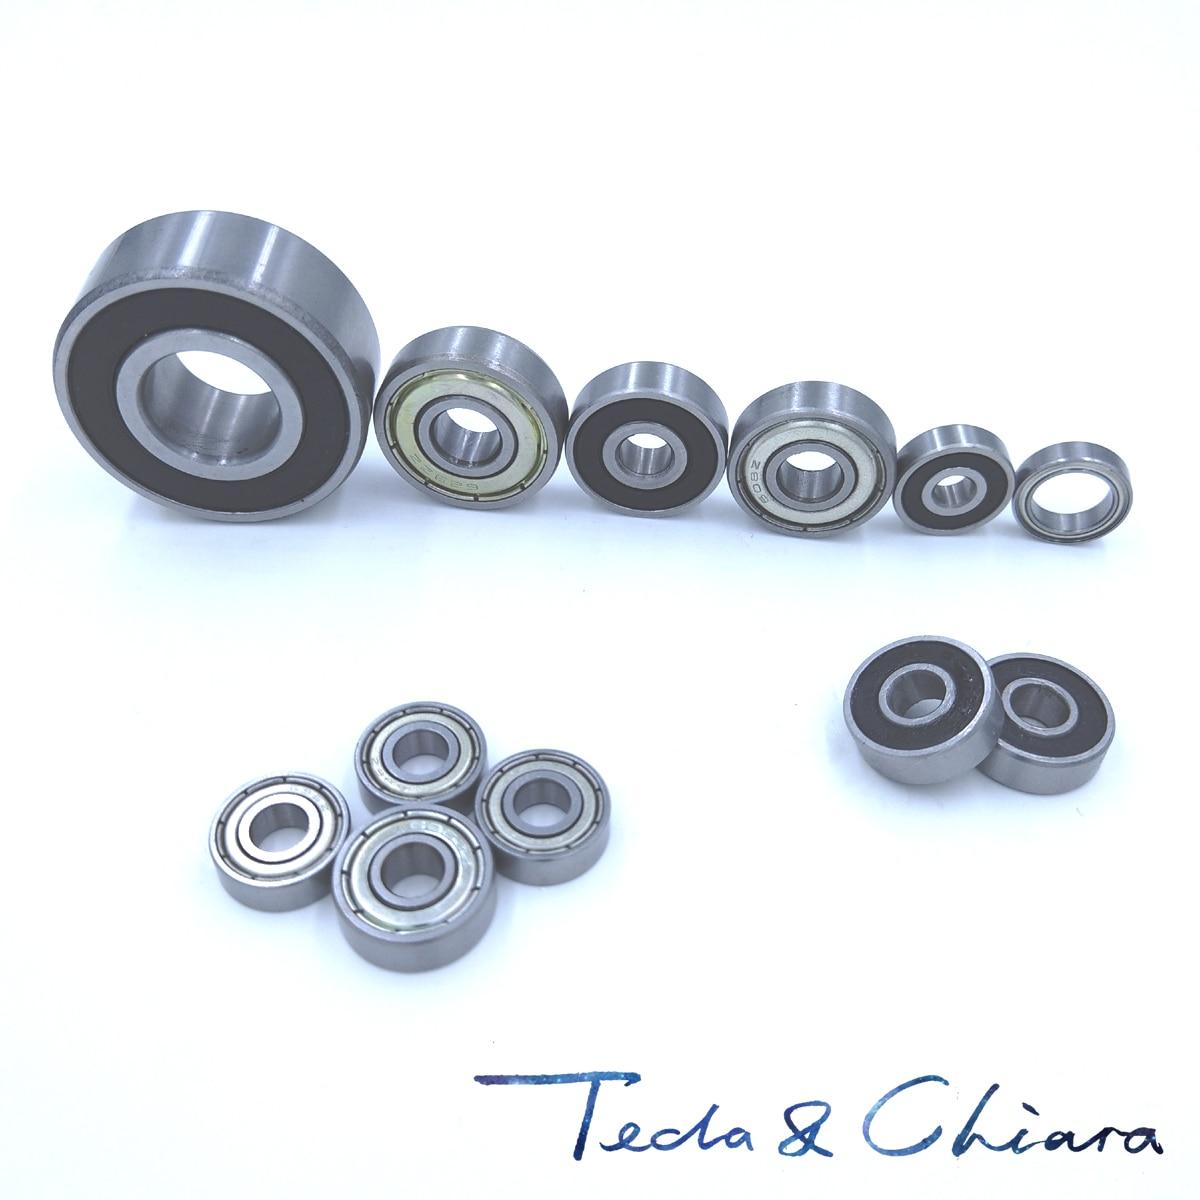 606 606ZZ 606RS 606-2Z 606Z 606-2RS ZZ RS RZ 2RZ Deep Groove Ball Bearings 6 x 17 x 6mm High Quality